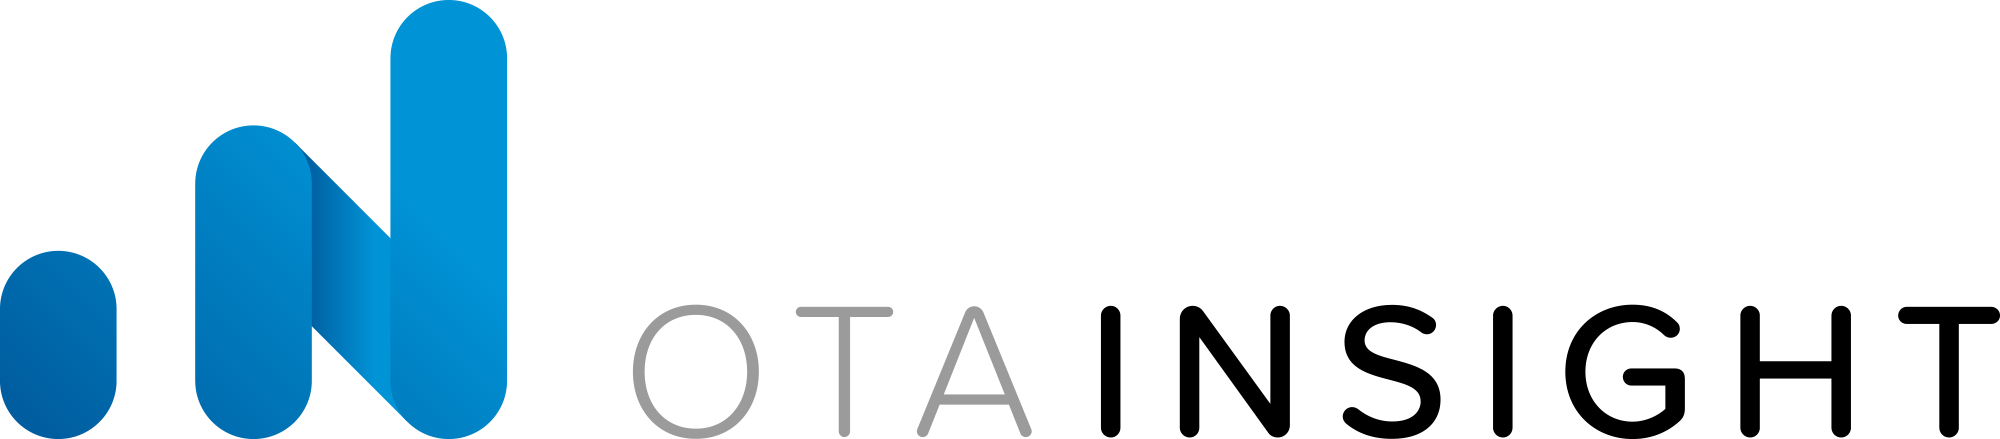 OTA Insight logo